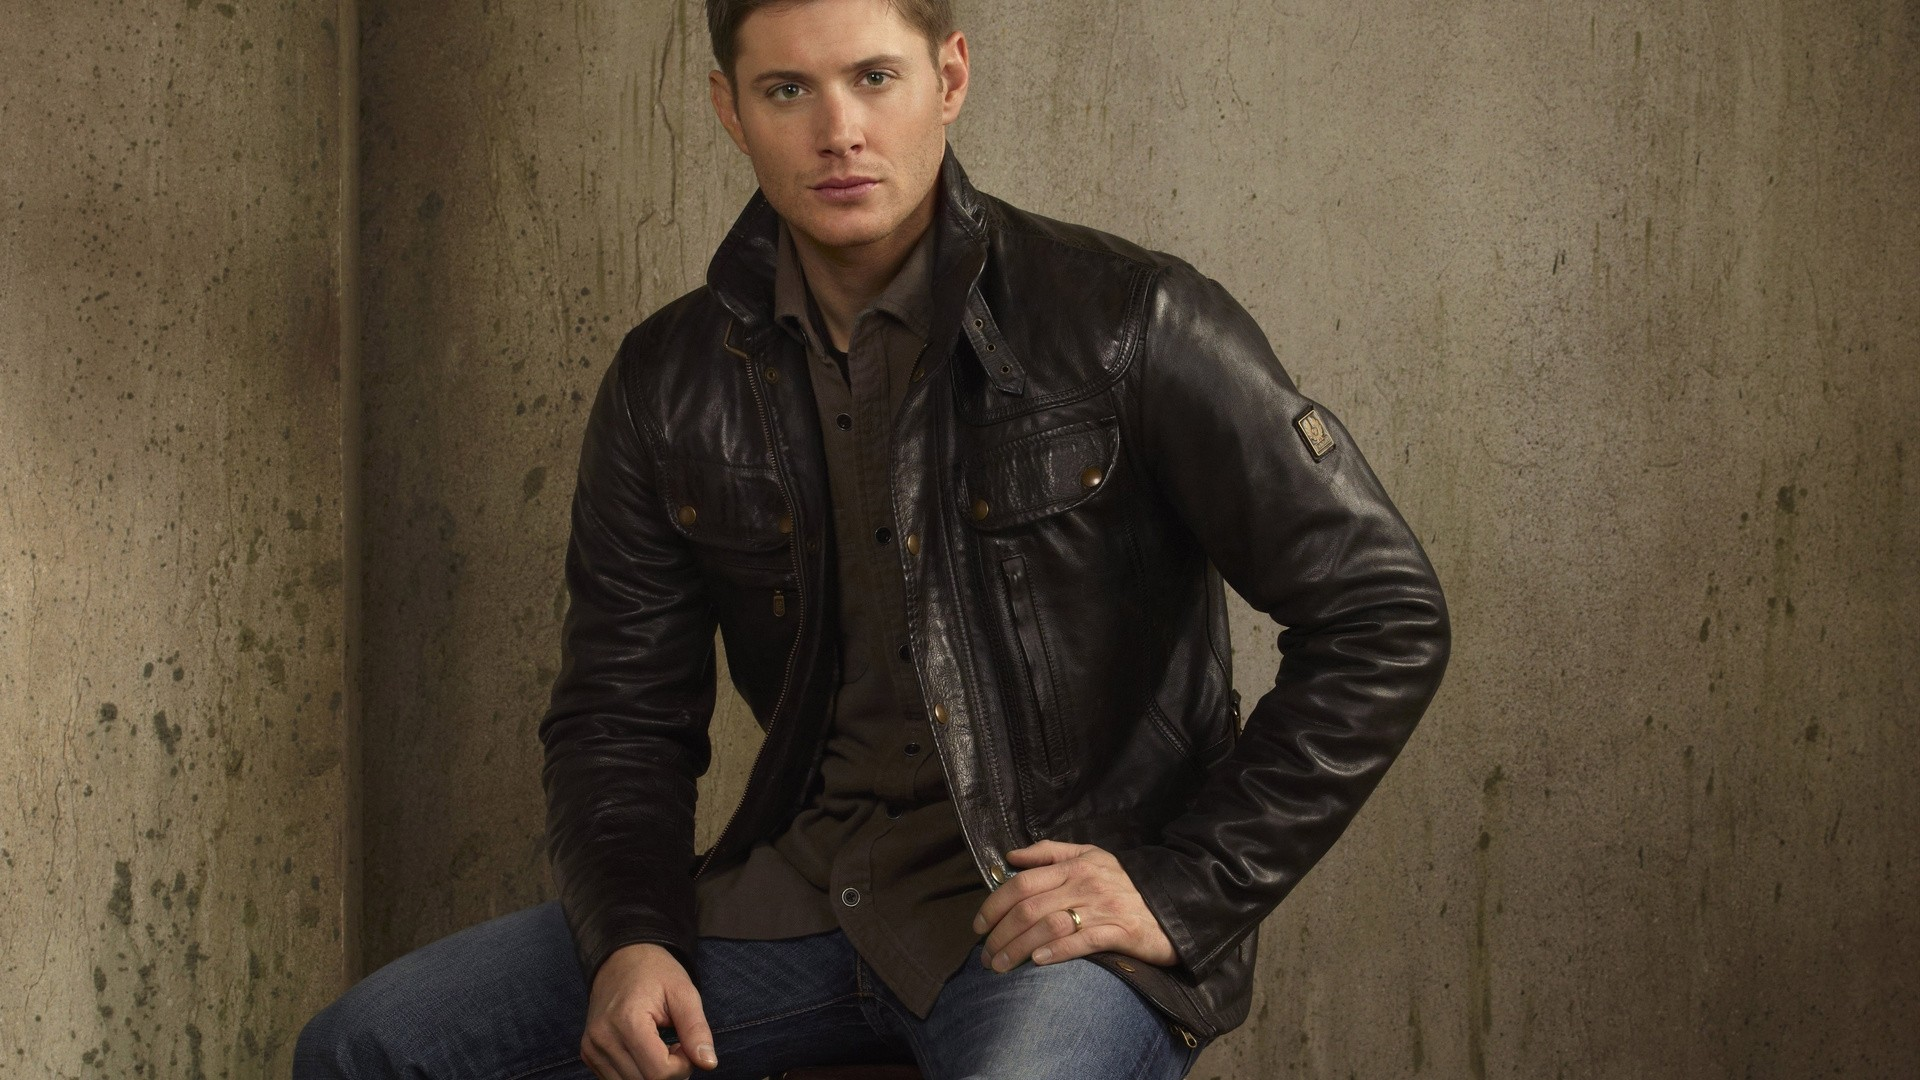 Jensen Ackles Wallpaper Image